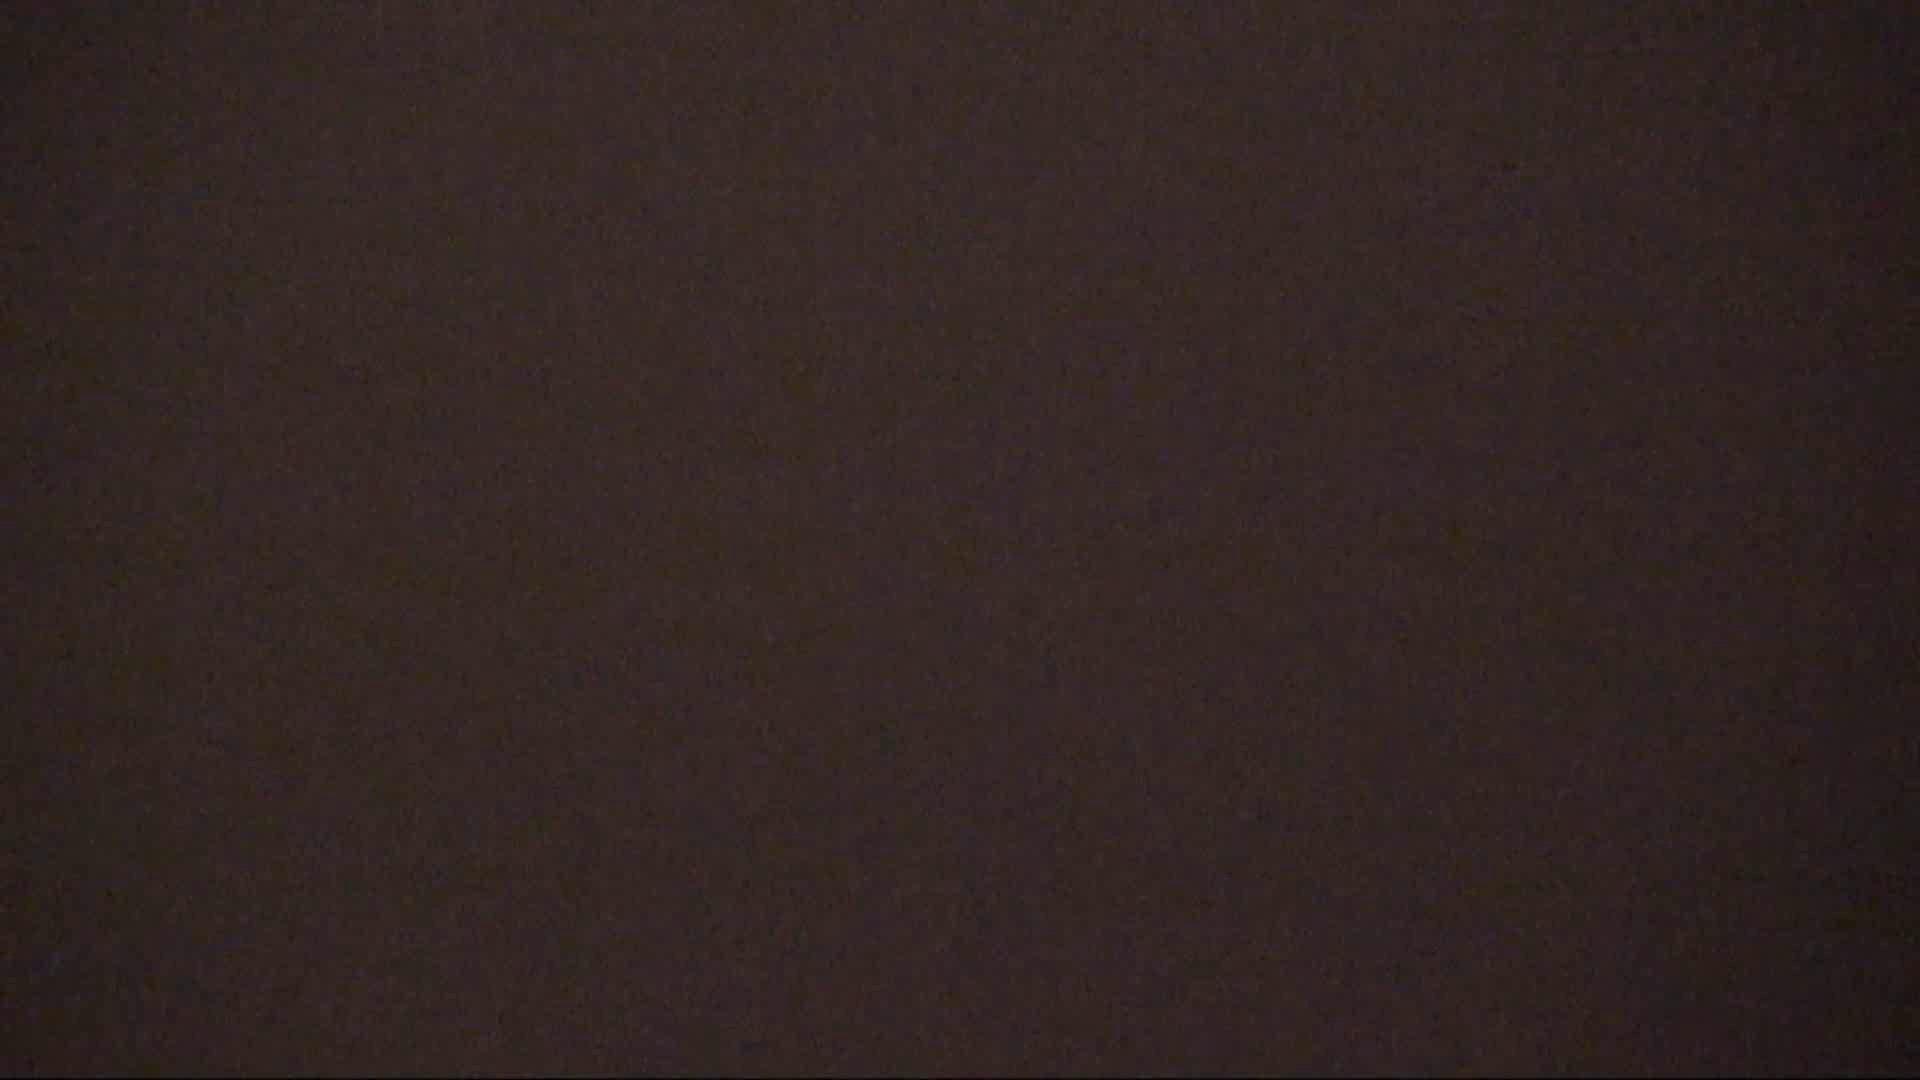 洗面所内潜入!同級生が同級生を盗撮! vol.02 洗面所 隠し撮りオマンコ動画紹介 98PIX 6